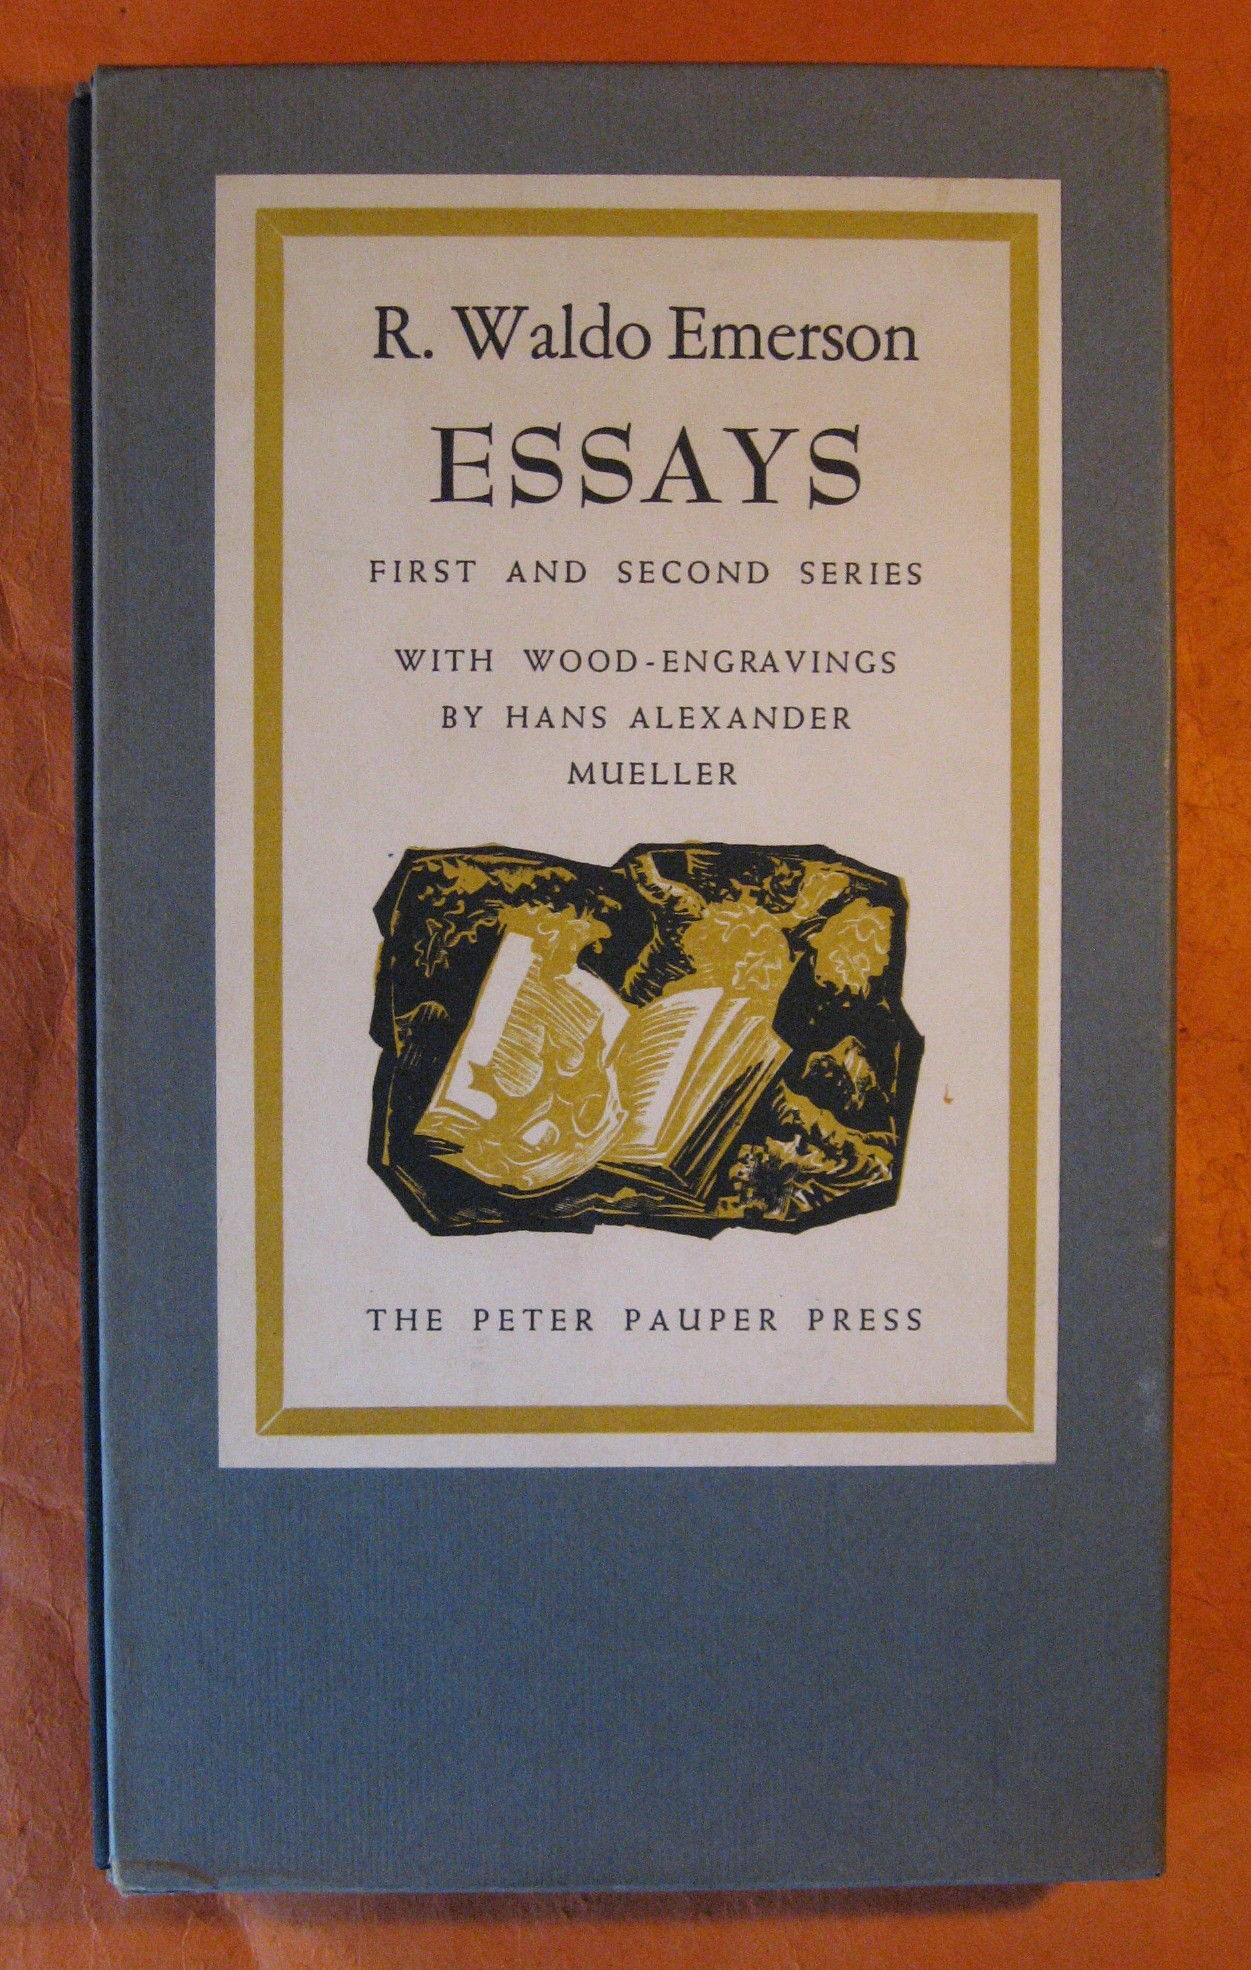 012 Essays First Series X Essay Stunning In Zen Buddhism Emerson's Value Full